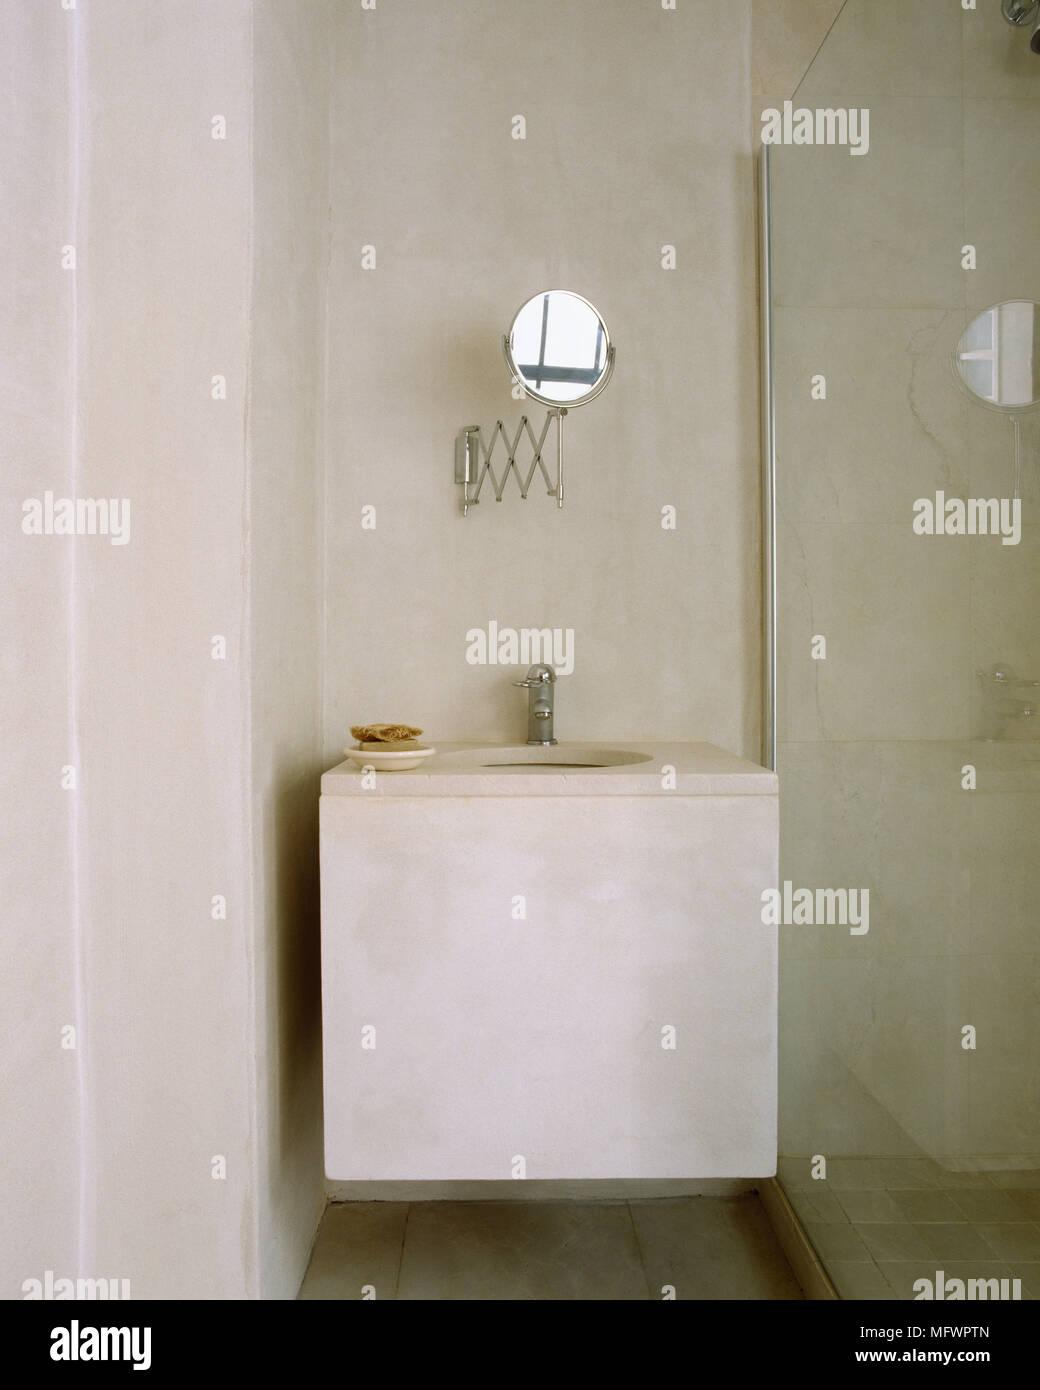 Minimalist Bathroom With Shaving Mirror Mounted Above Washbasin Next To Glass Shower Screen Stock Photo Alamy